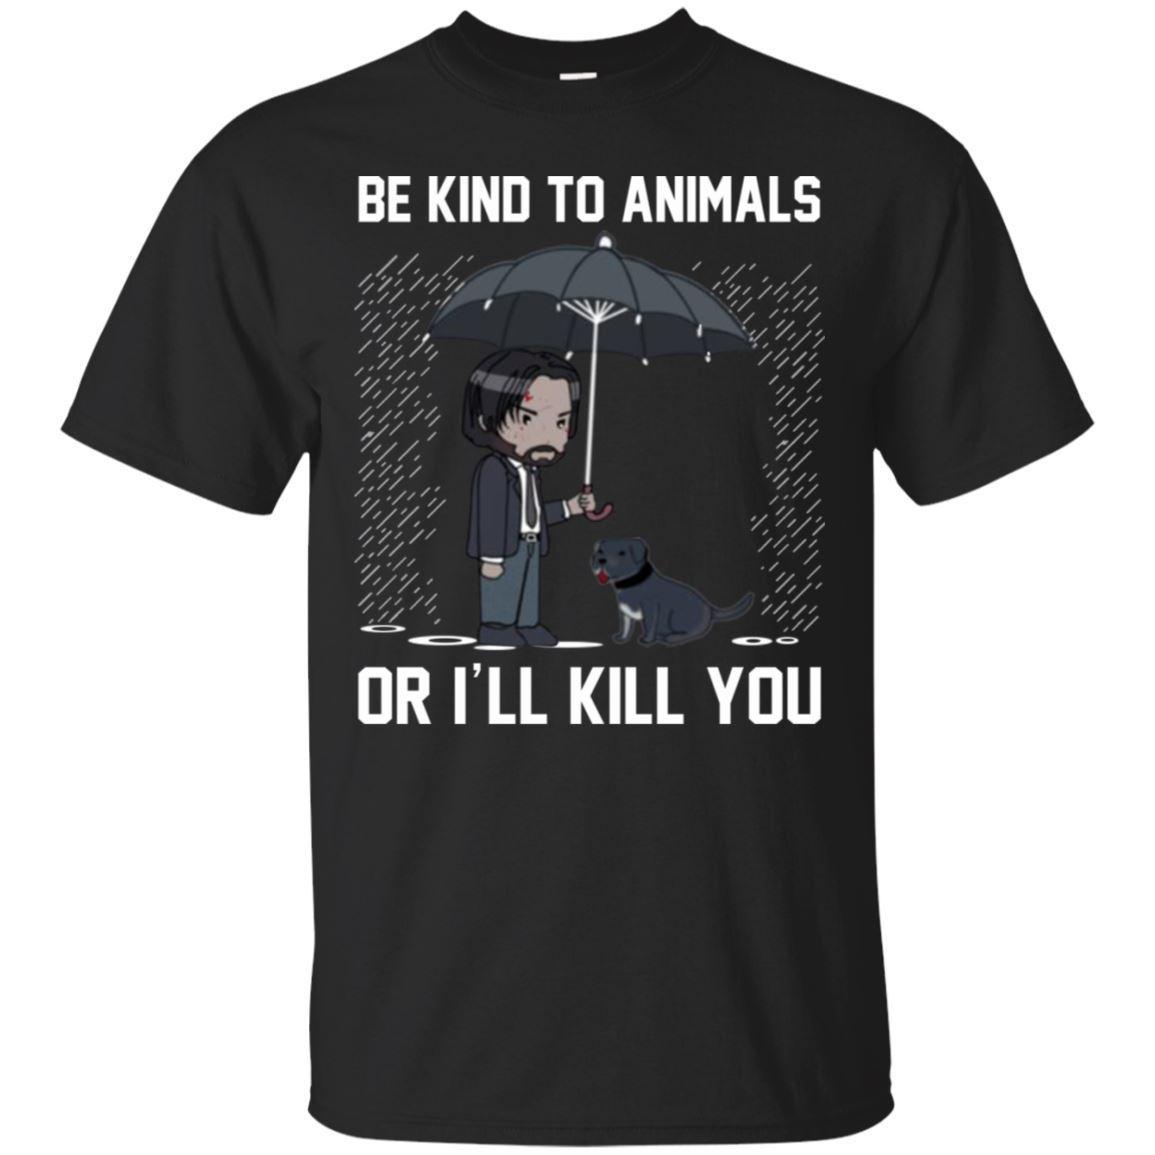 Keanu Reeves T-shirt Be Kind To Animal Or I'll Kill You Shirt Short Sleeve    Cool Casual Pride T Shirt Men Unisex Fashion